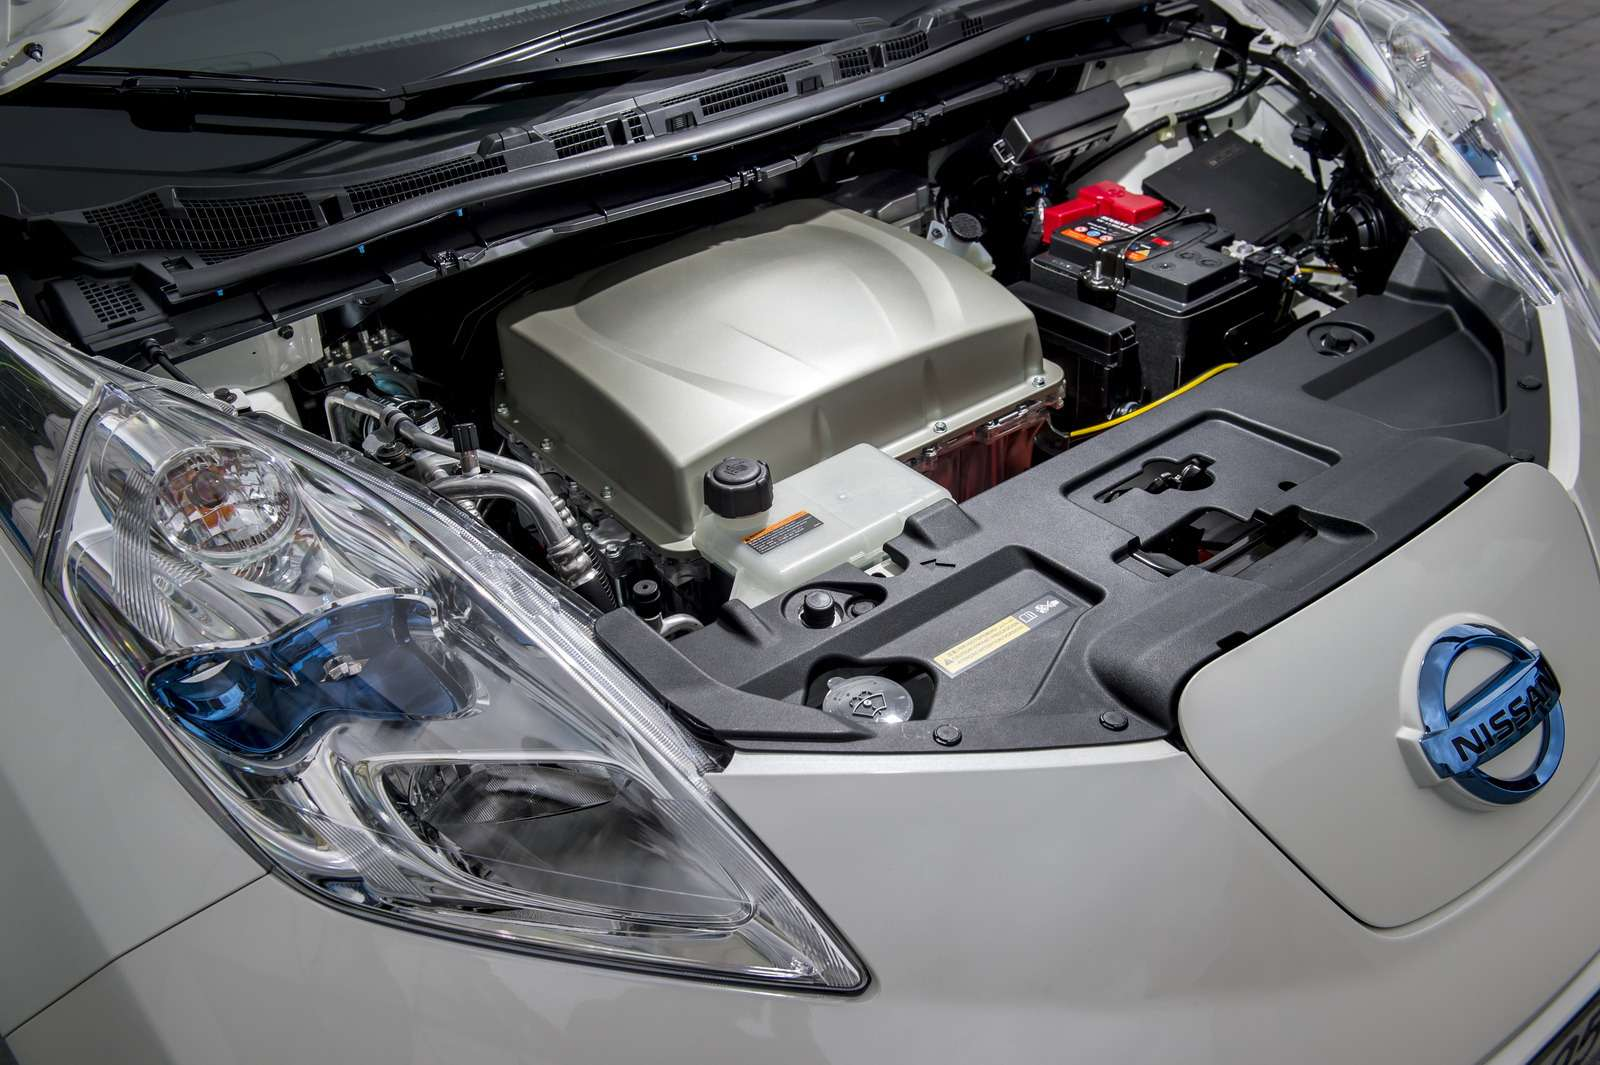 30kwh Nissan LEAF inSaint-Etienne Metropole— agence LIN